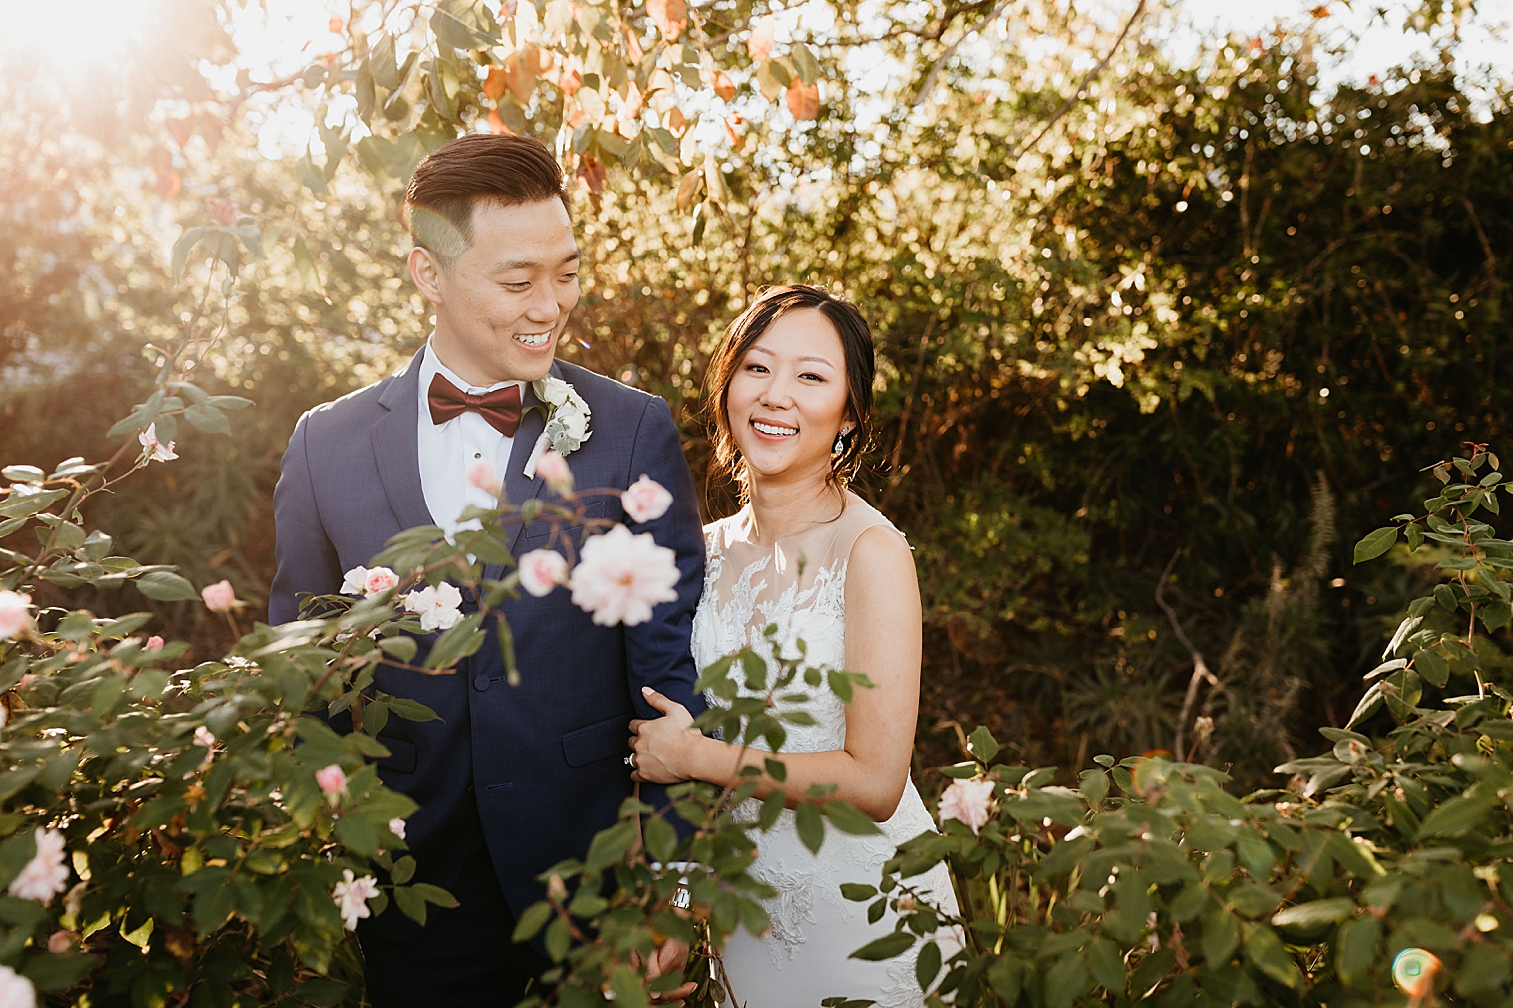 Secret-Garden-Rancho-Santa-Fe-Wedding-92.jpg